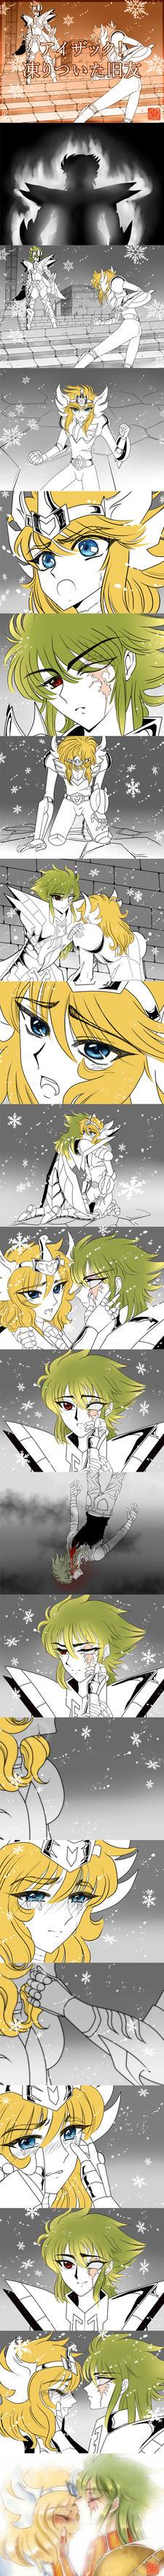 Isaak and Hyoga Doujinshi by Luna-Akari